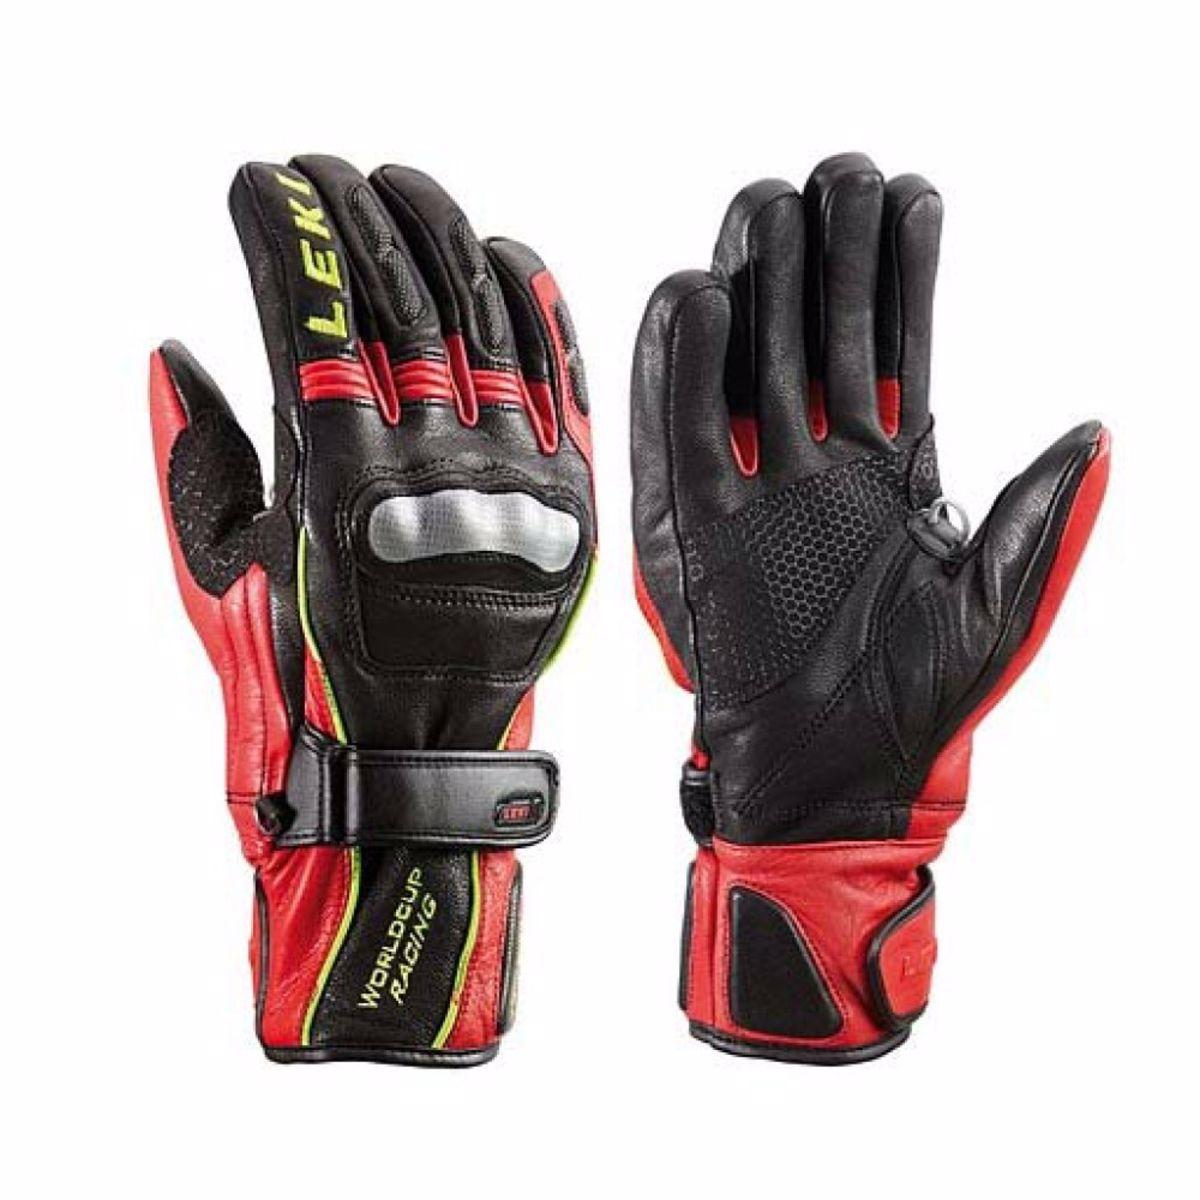 LEKI WC Racing GS zimné rukavice  507542dfc80